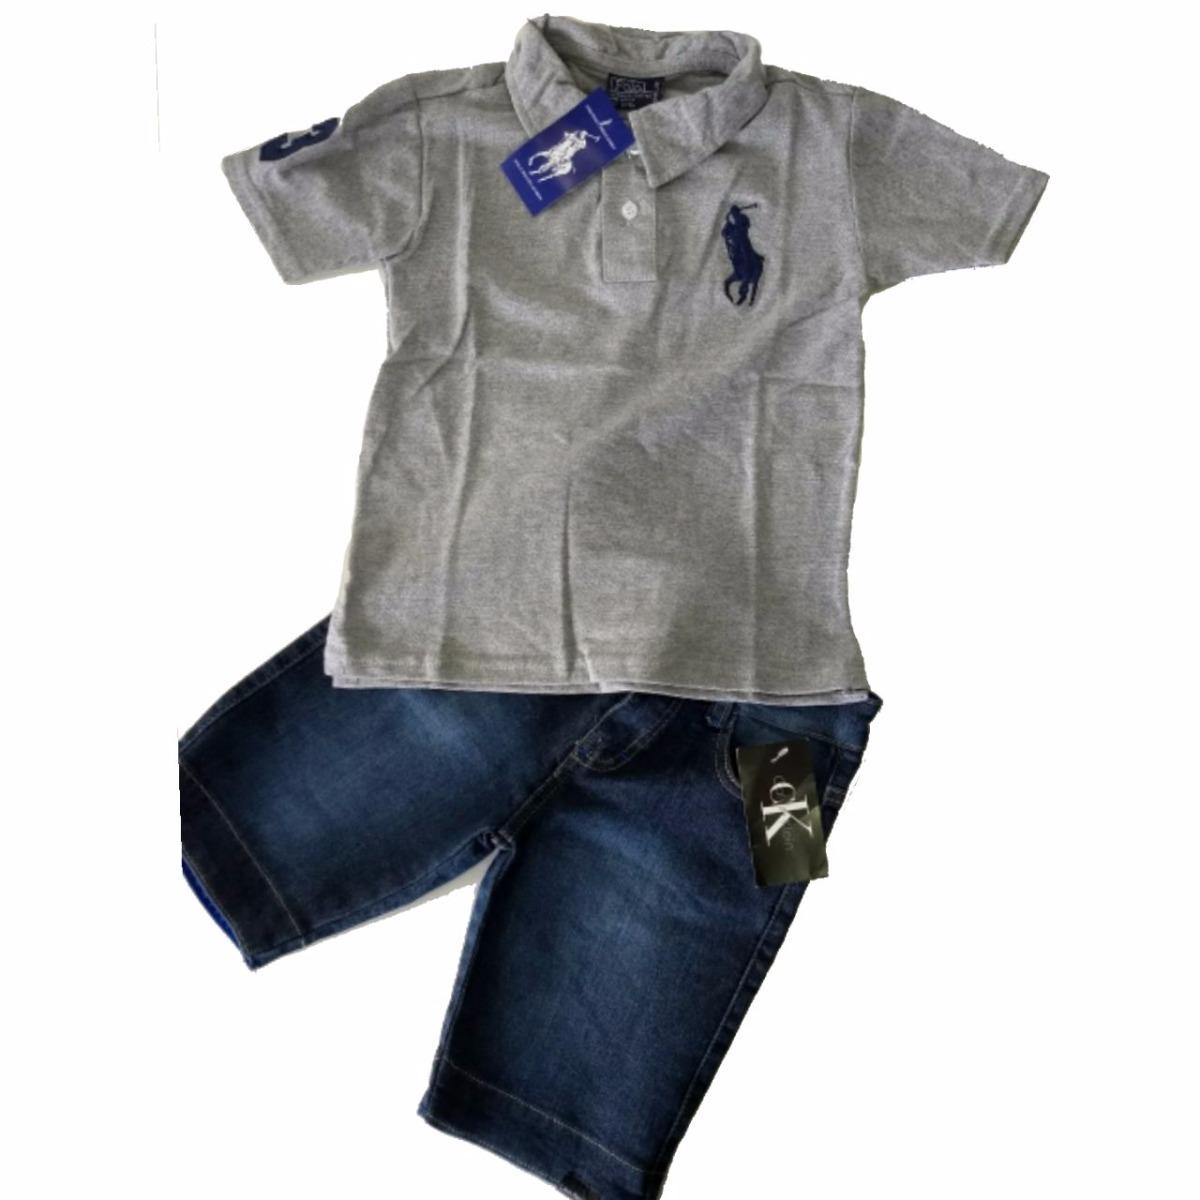 conjunto infantil camiseta polo bermuda jeans menino camisa. Carregando  zoom. d0b3a259a2275